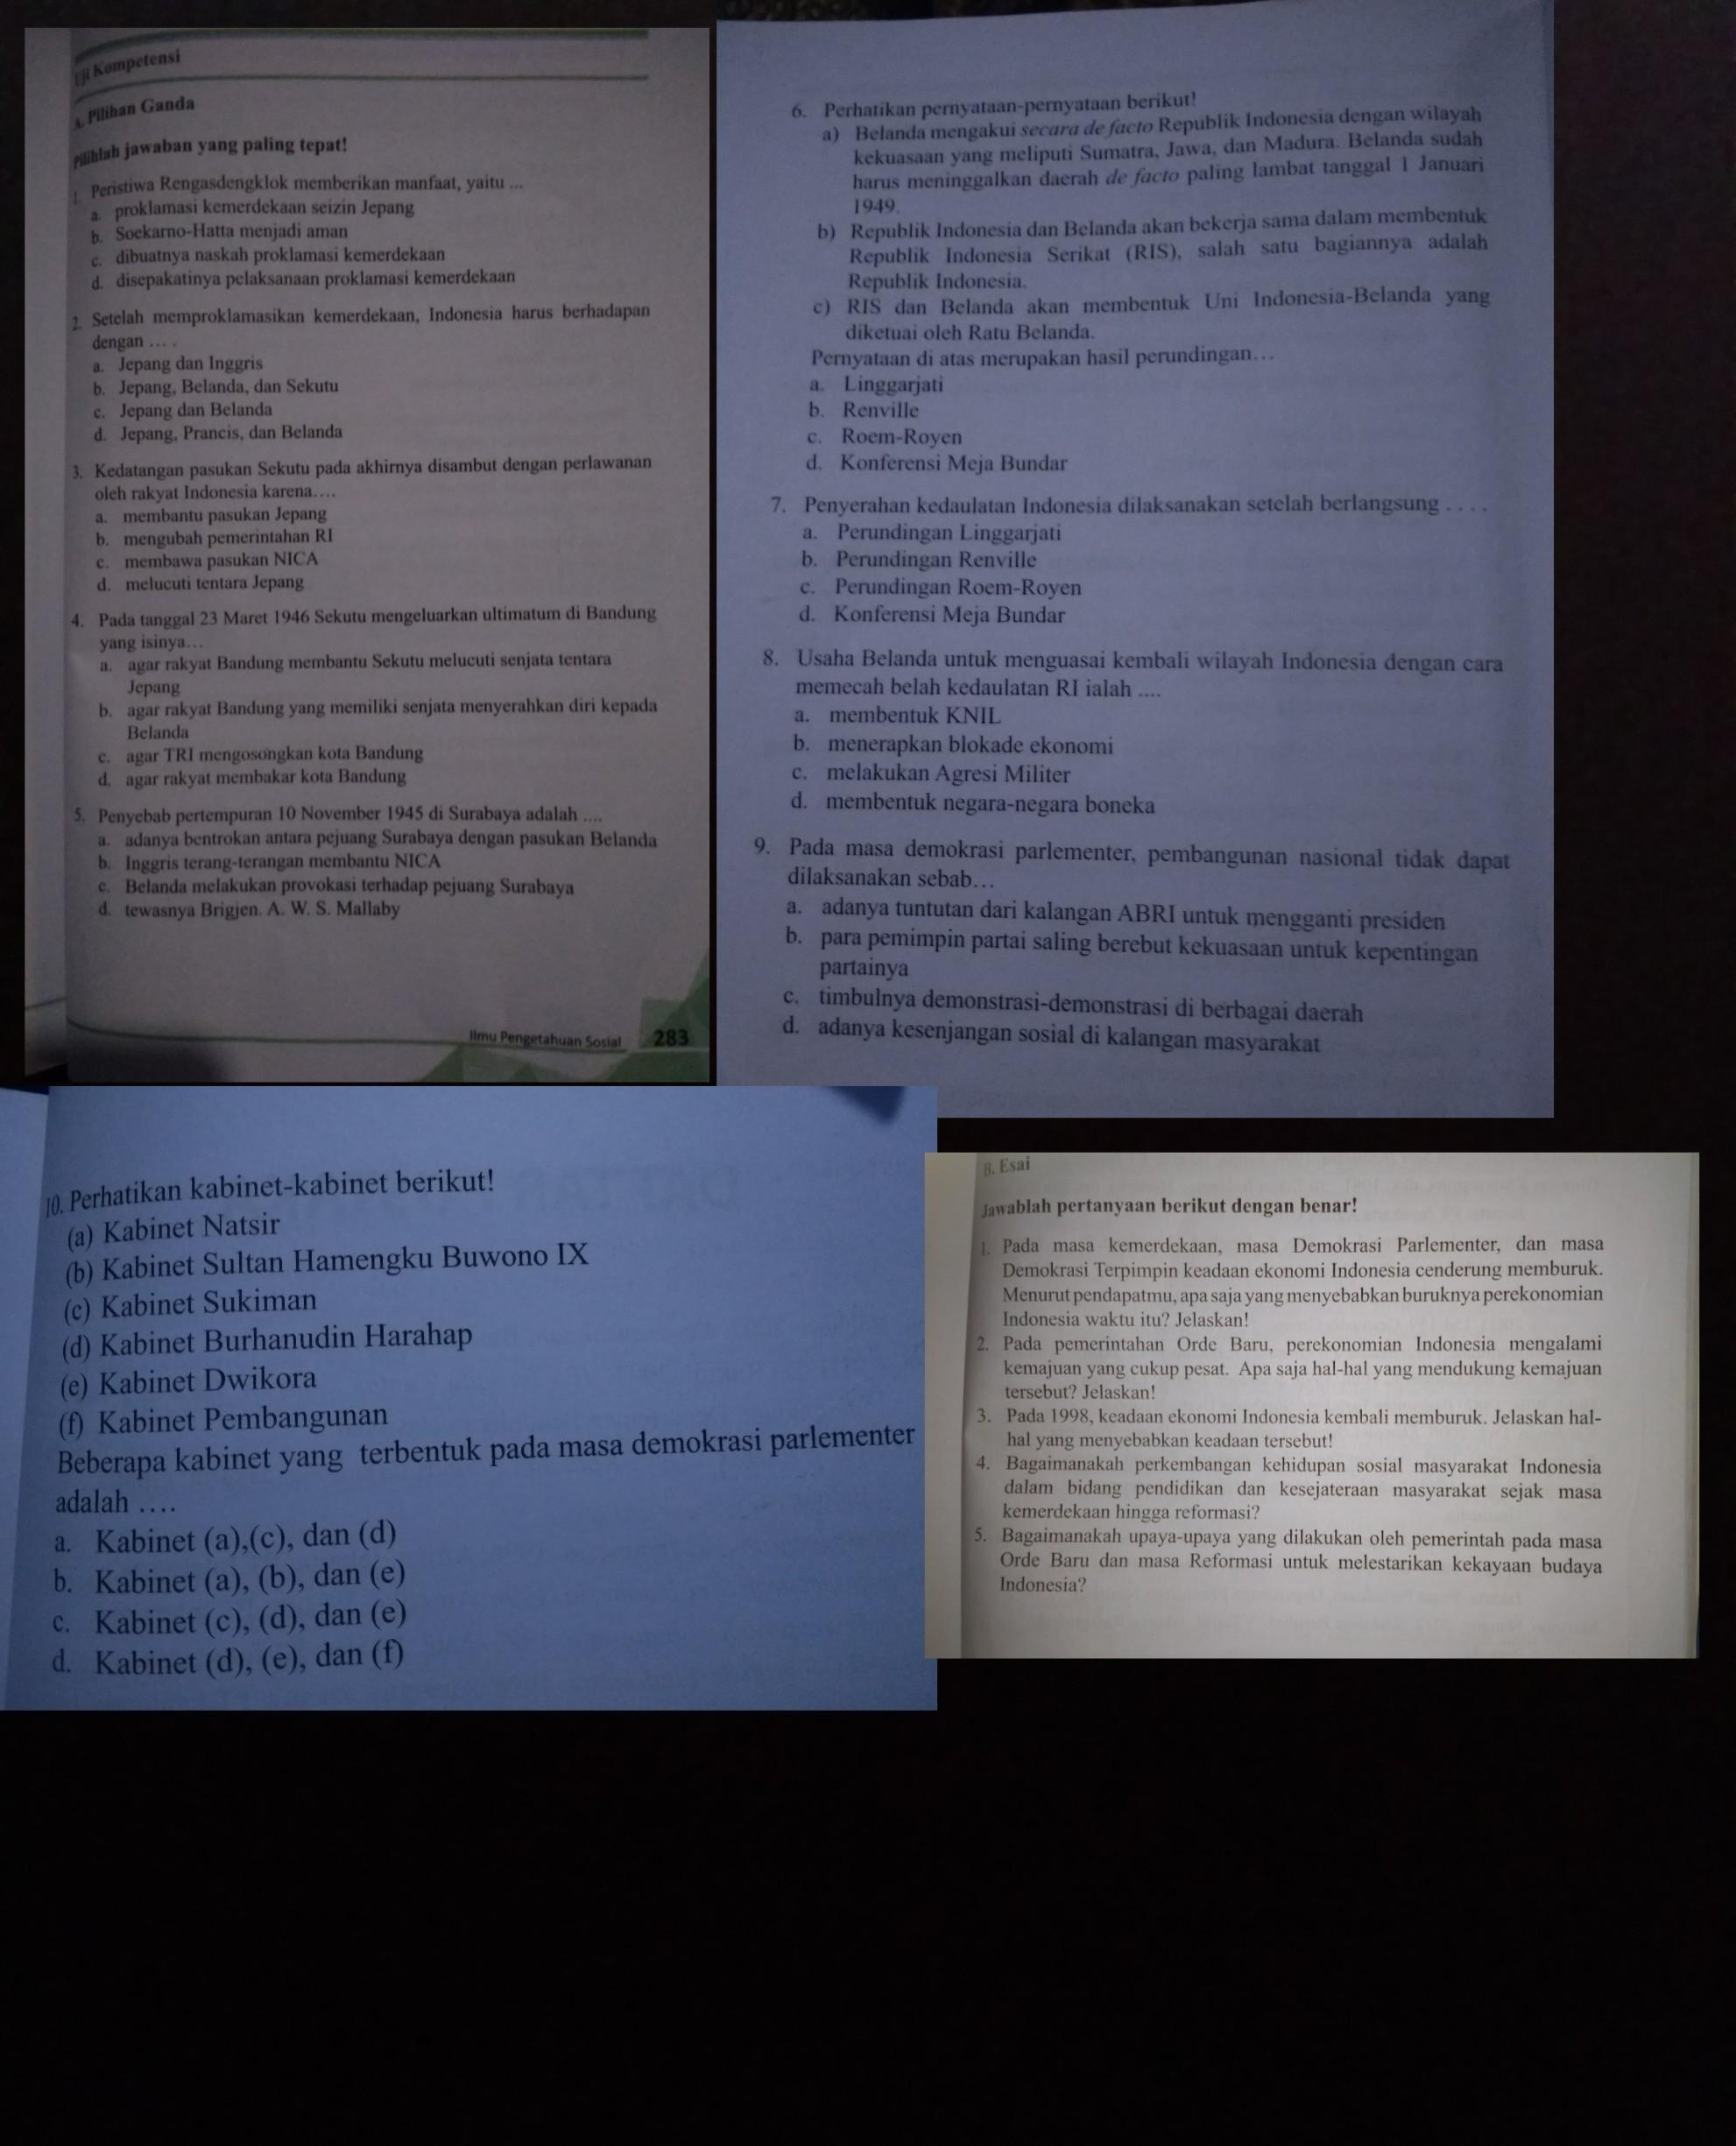 Jawaban Pilihan Ganda Ips Bab 4 Kelas 9 Halaman 283 285 Besok Di Kumpul Brainly Co Id